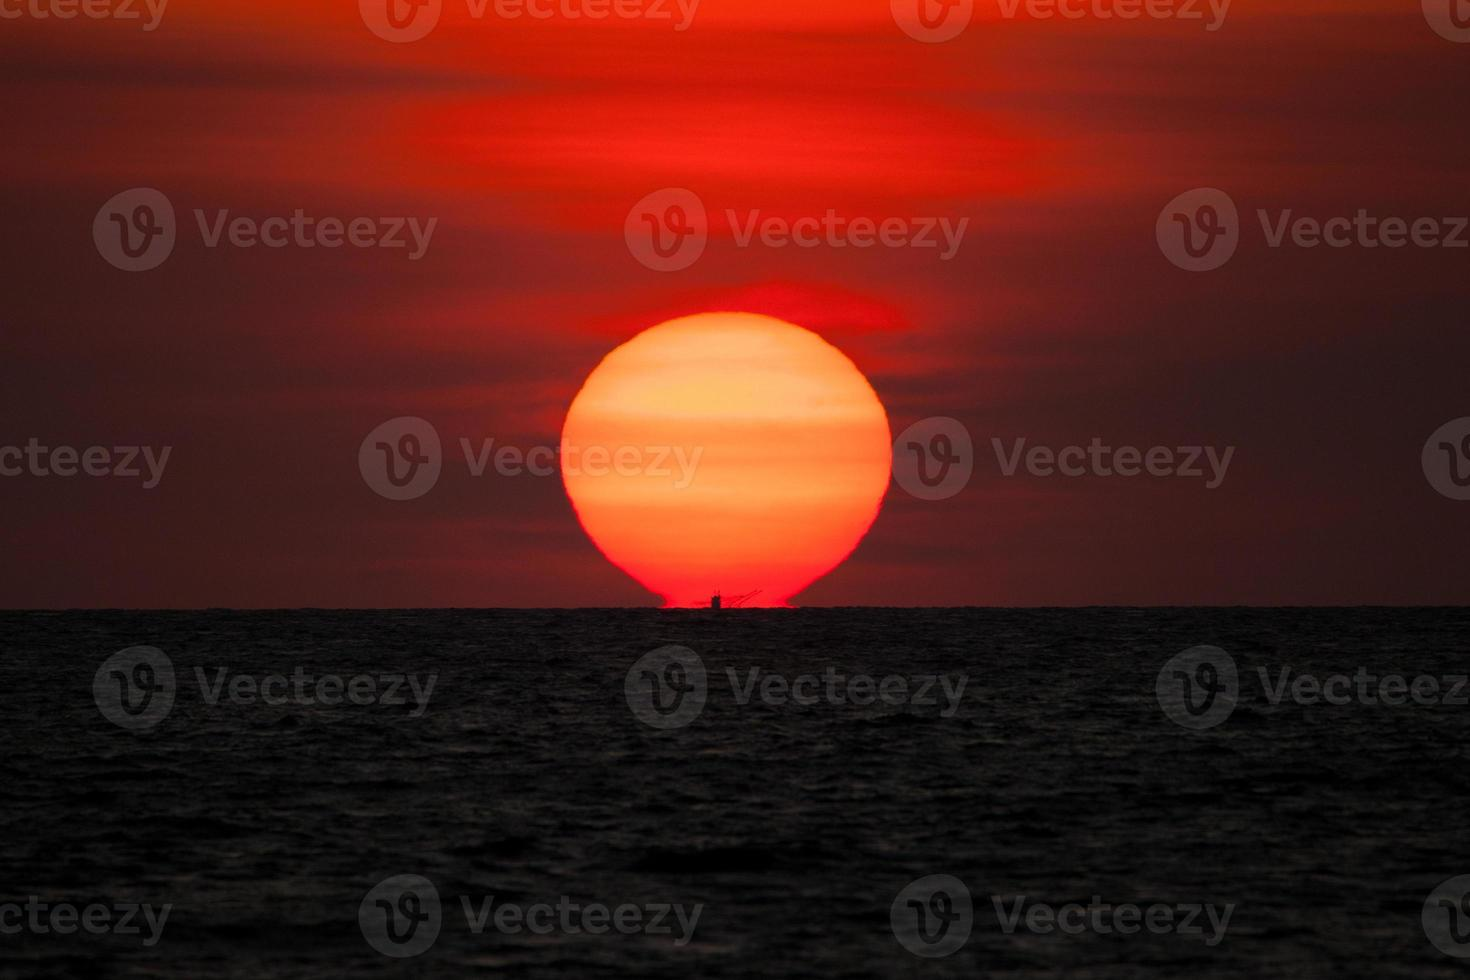 vergrößerte Sonne bei Sonnenuntergang foto